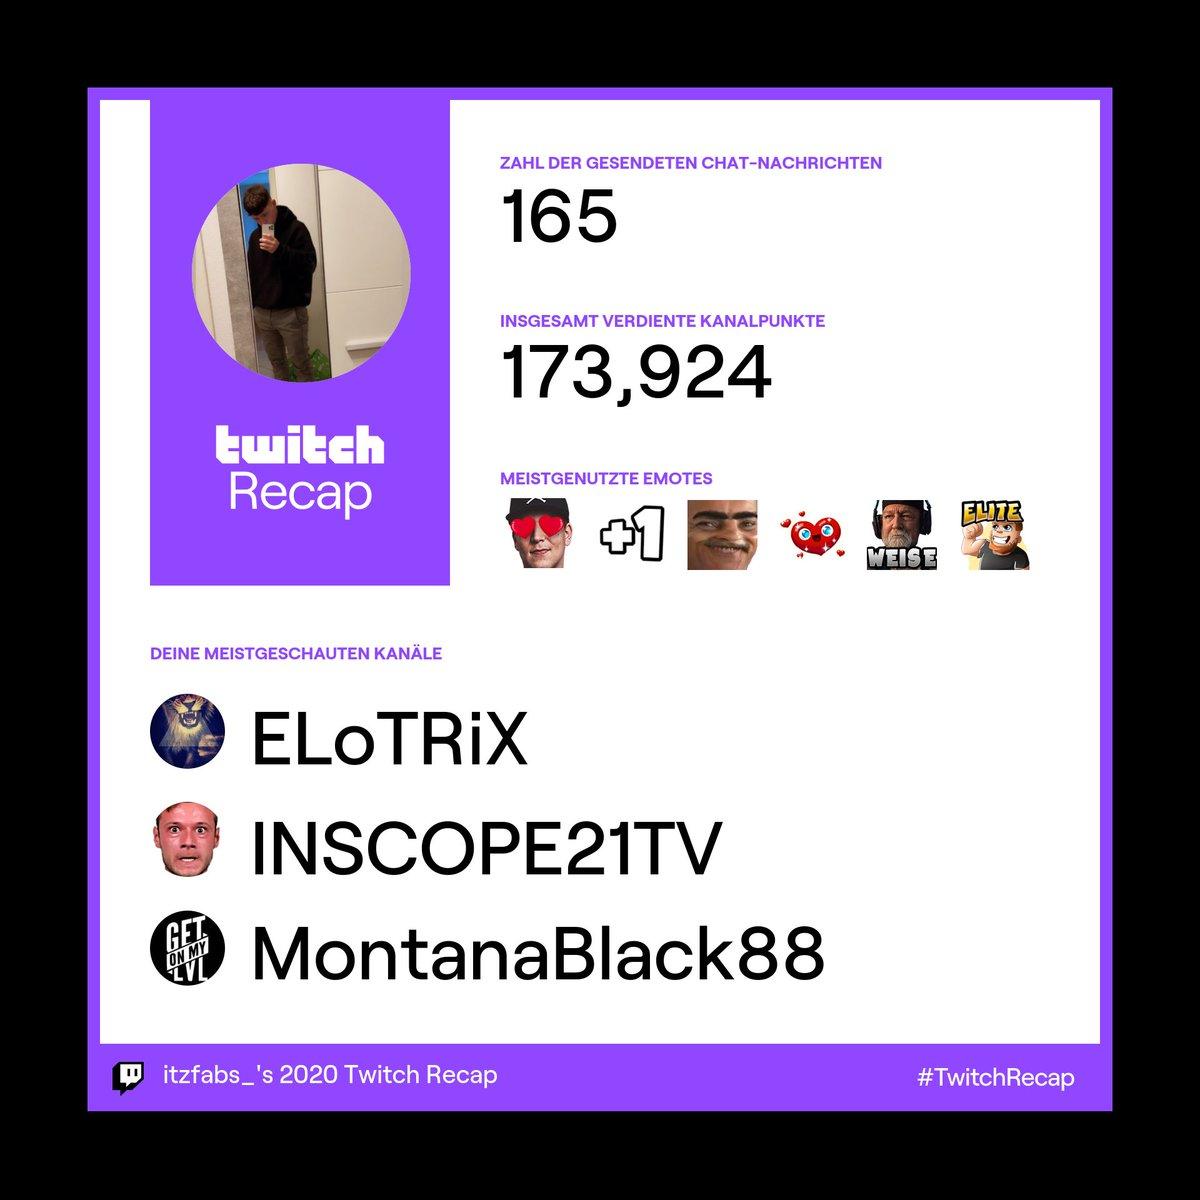 @ELoTRiX kuss kuss kuss❤️ @inscopenico kuss du lappen @MontanaBlack ❤️ #TwitchRecap #twitch #2020